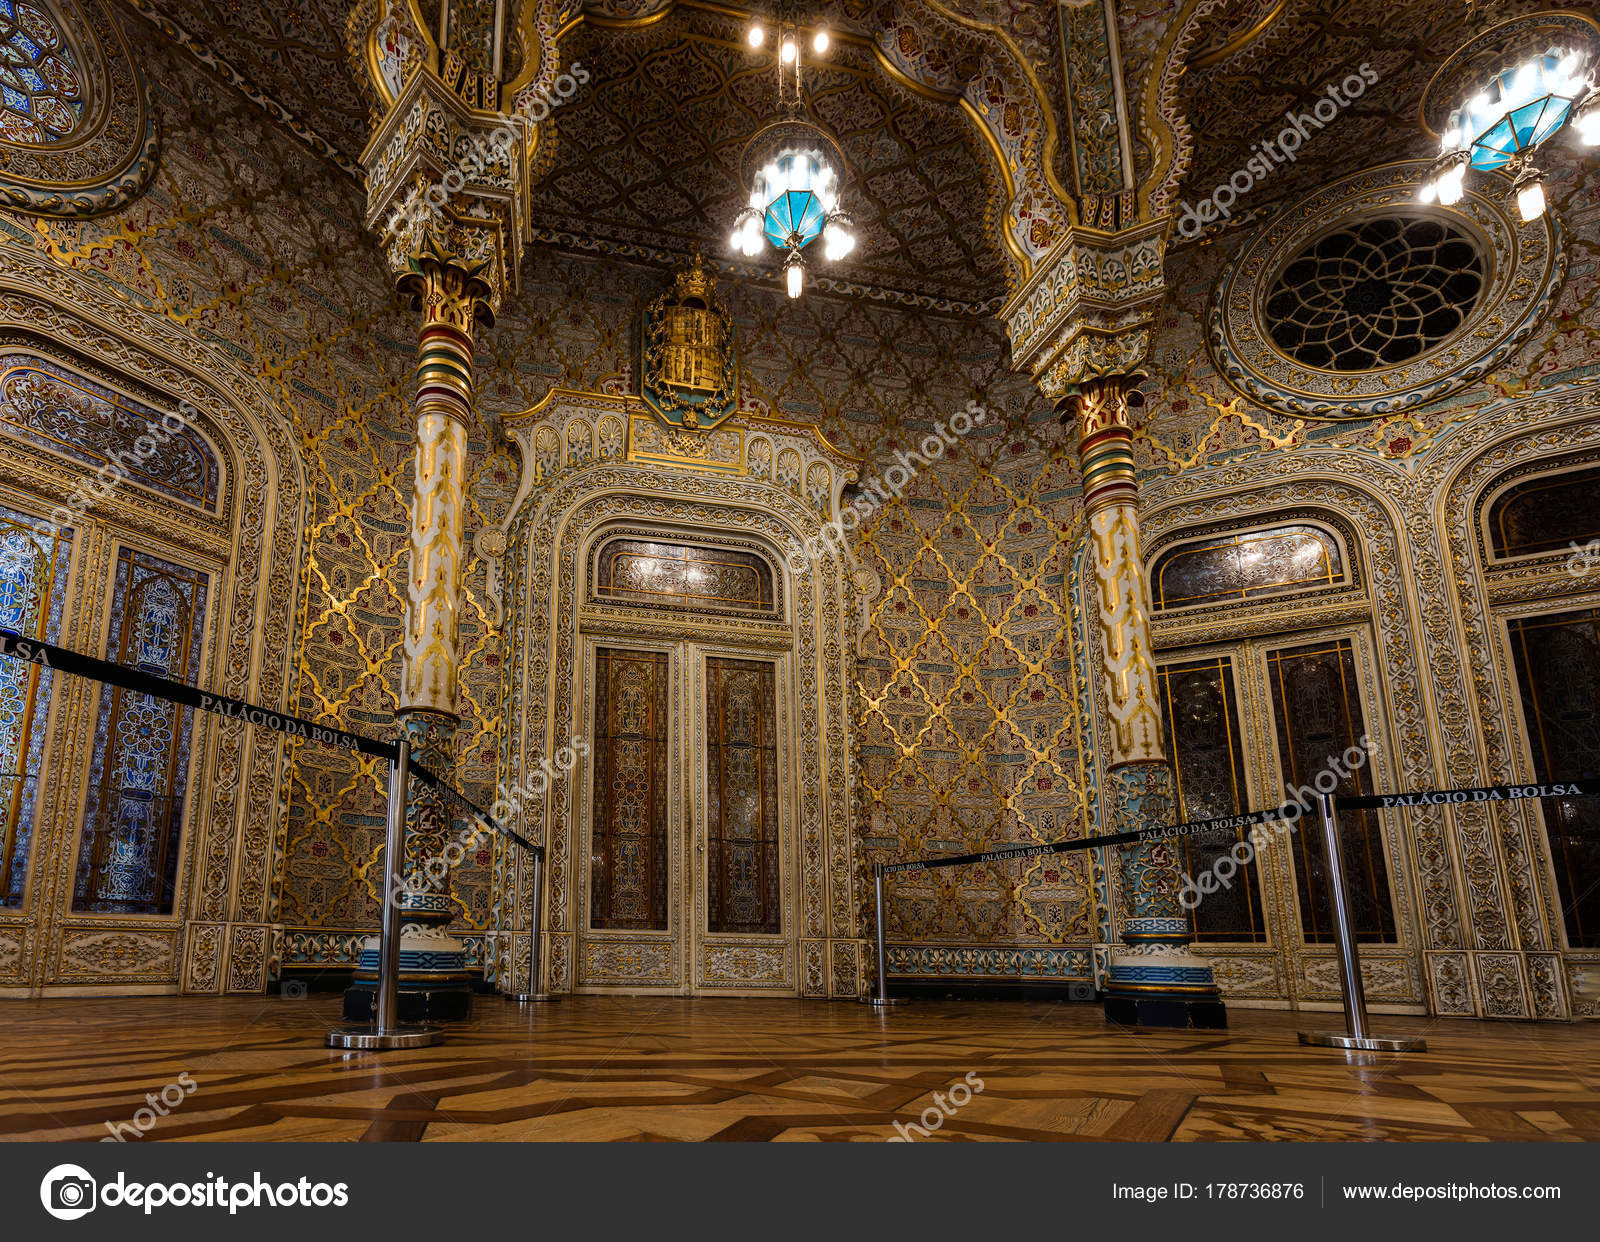 Arab The Bolsa Room In – Moorish Editorial Revival Palace Stock 8wPnX0Ok